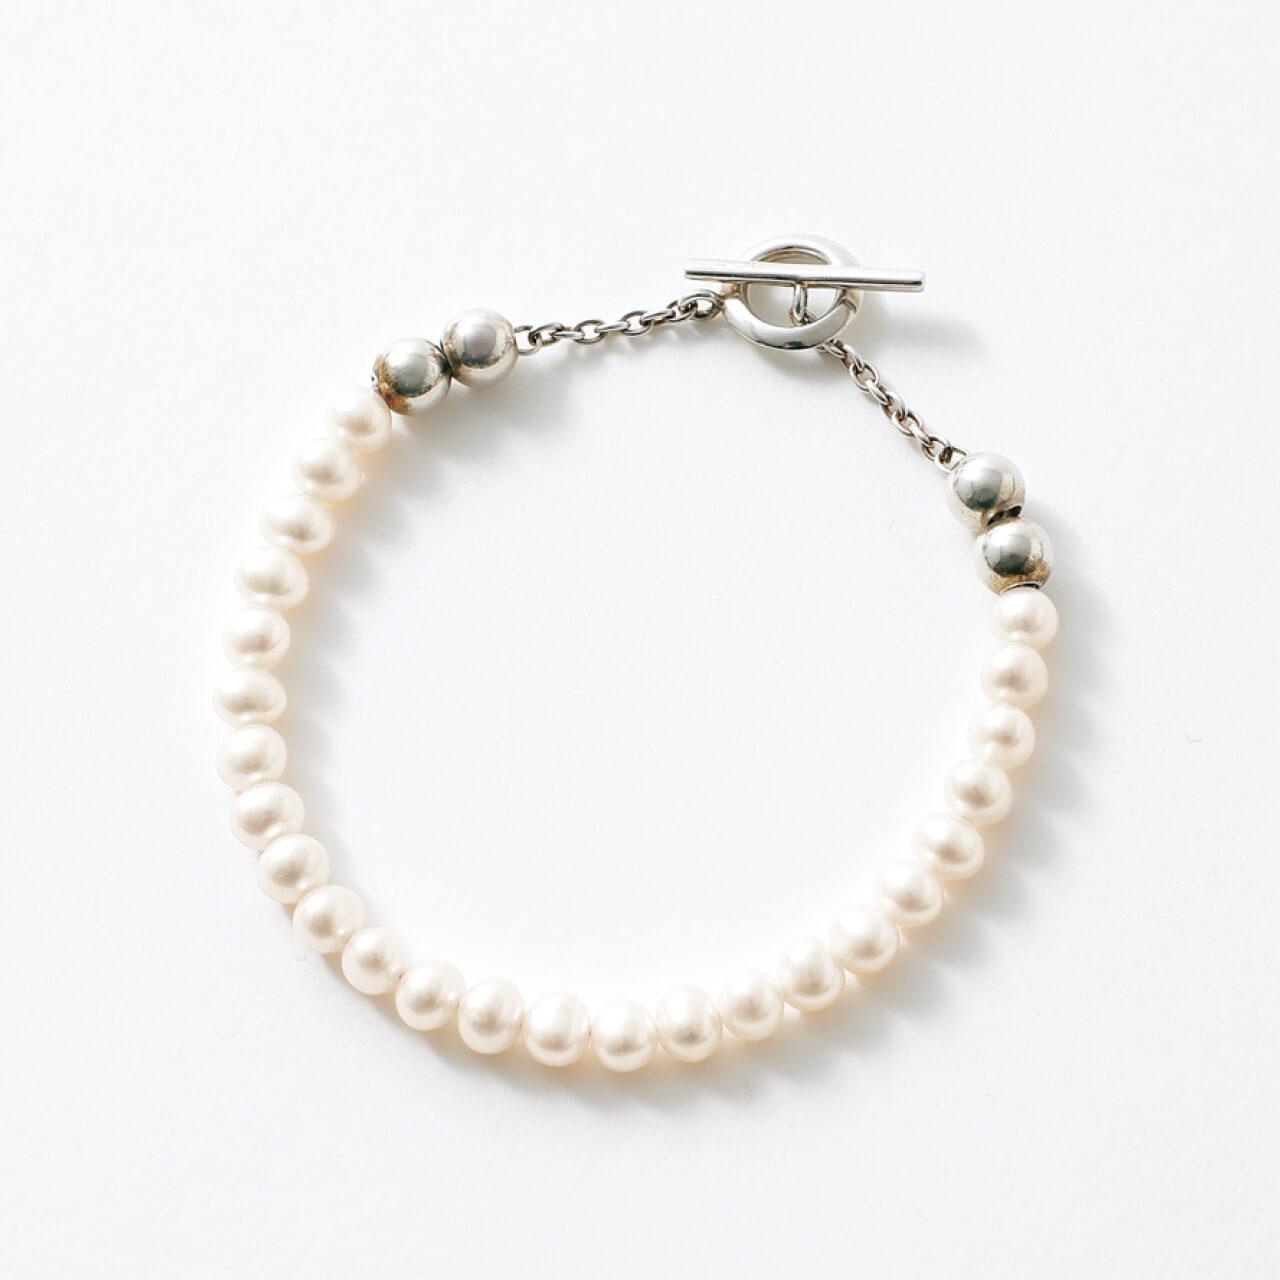 Sympathy of soul style シンパシー オブ ソウル スタイル Pearl Beads T-bar Bracelet ¥17600